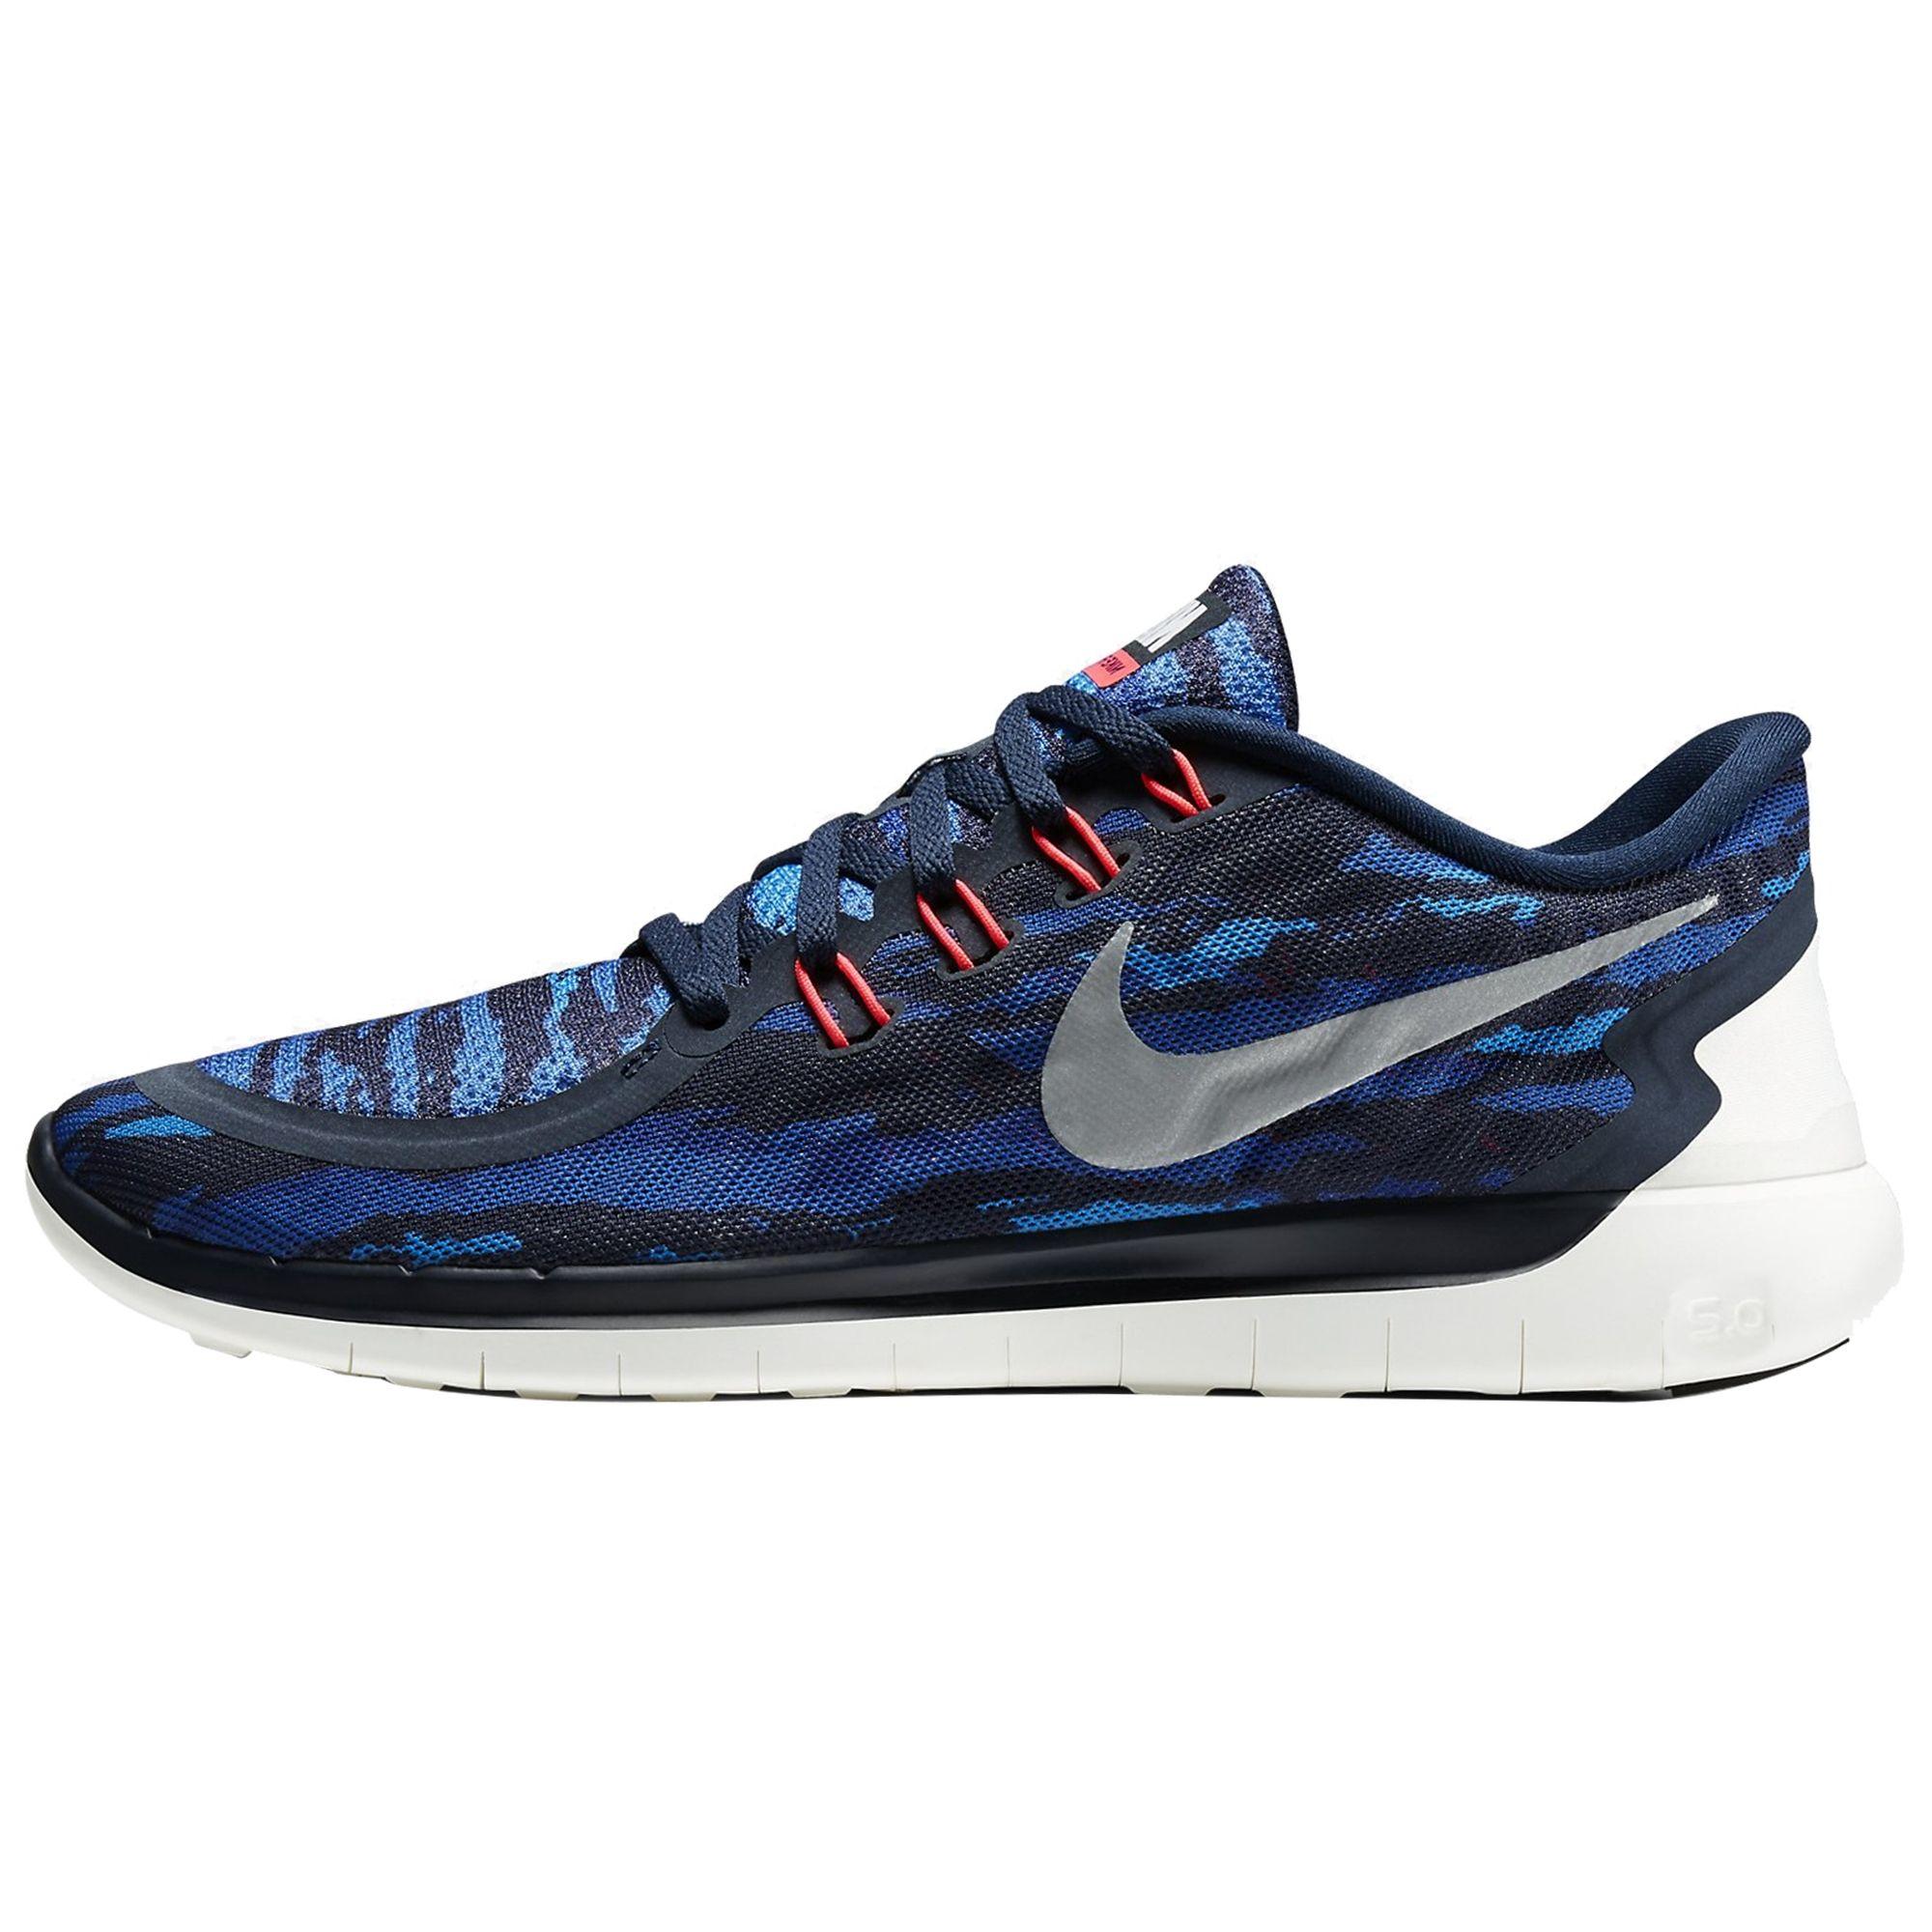 Nike Free 5.0 Print Erkek Spor Ayakkabı #749592-401 - Barcin.com